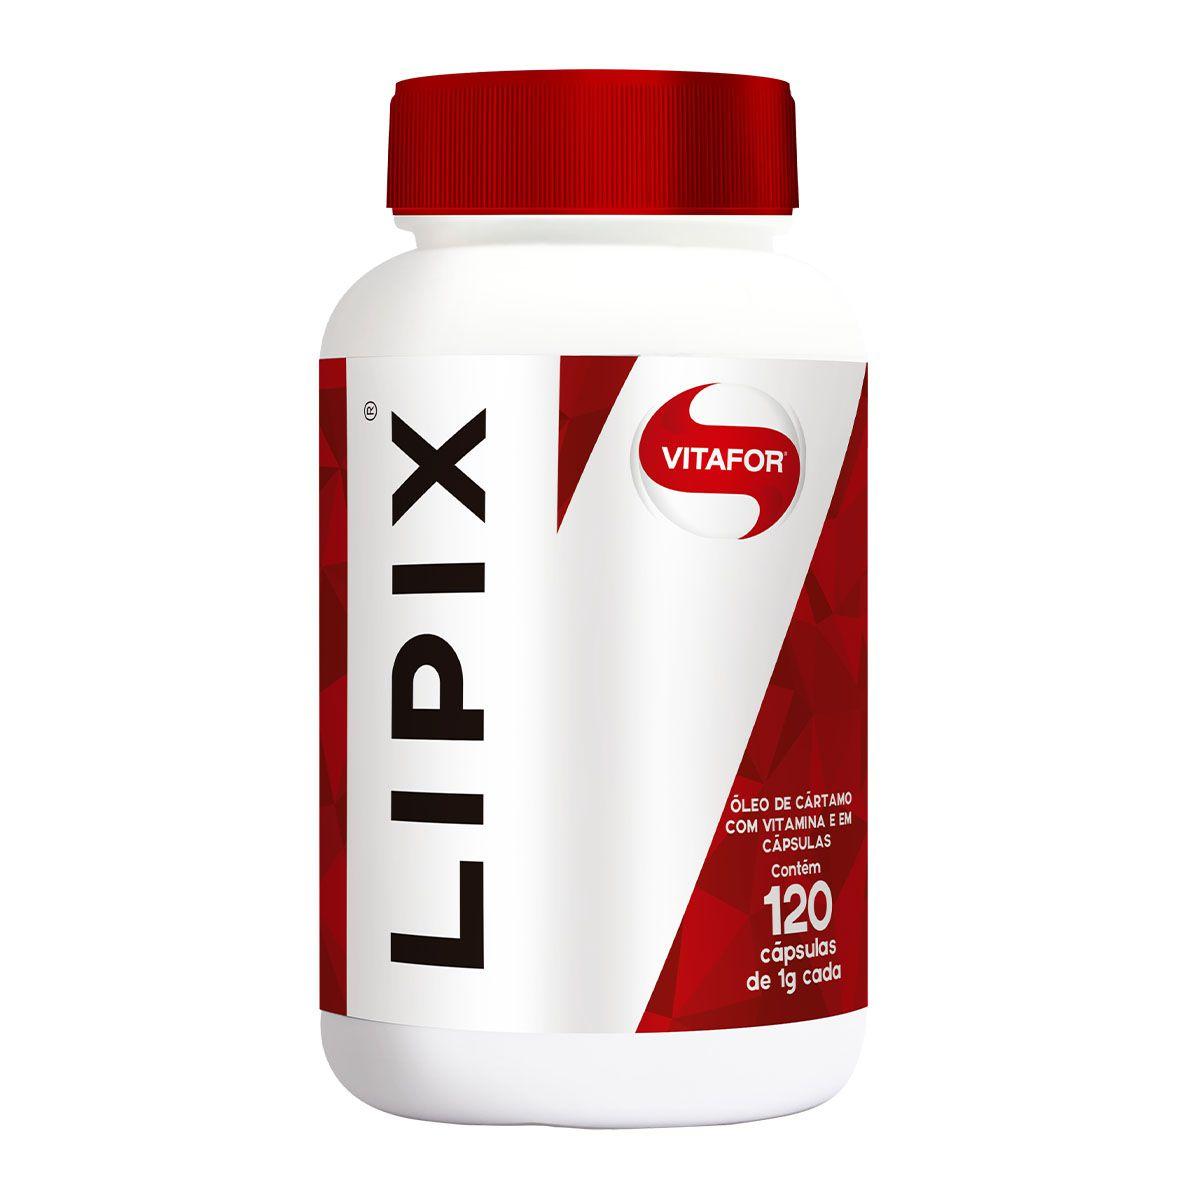 Lipix 120 cápsulas - Vitafor